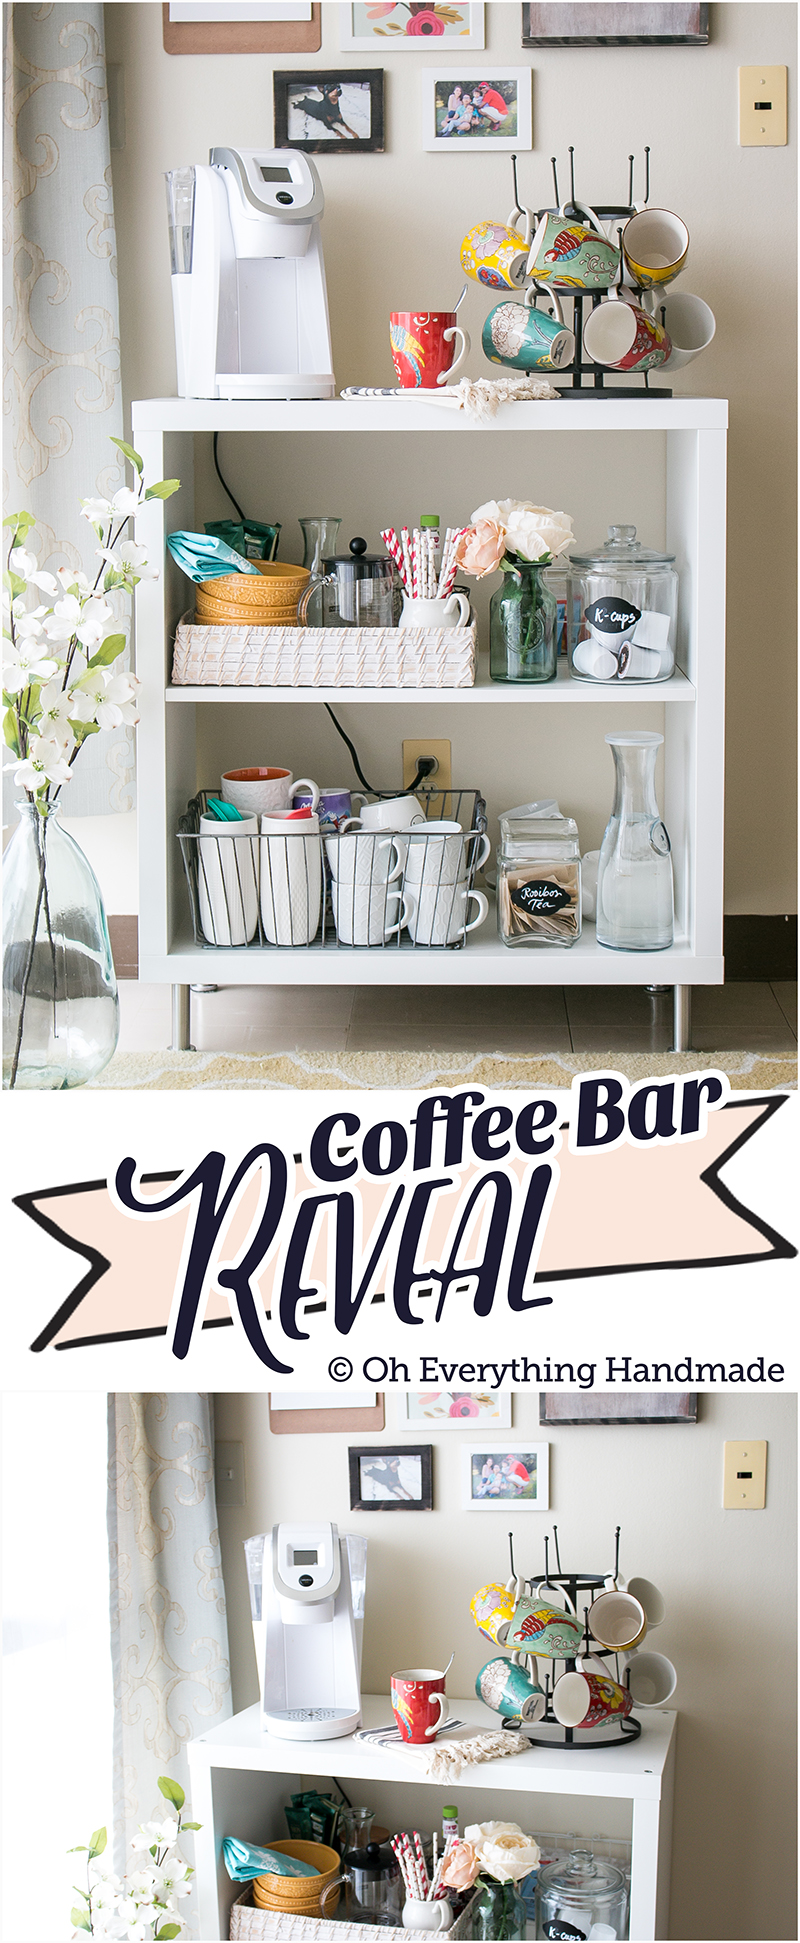 Coffee Bar via OhEverythingHandmade - Pinterest